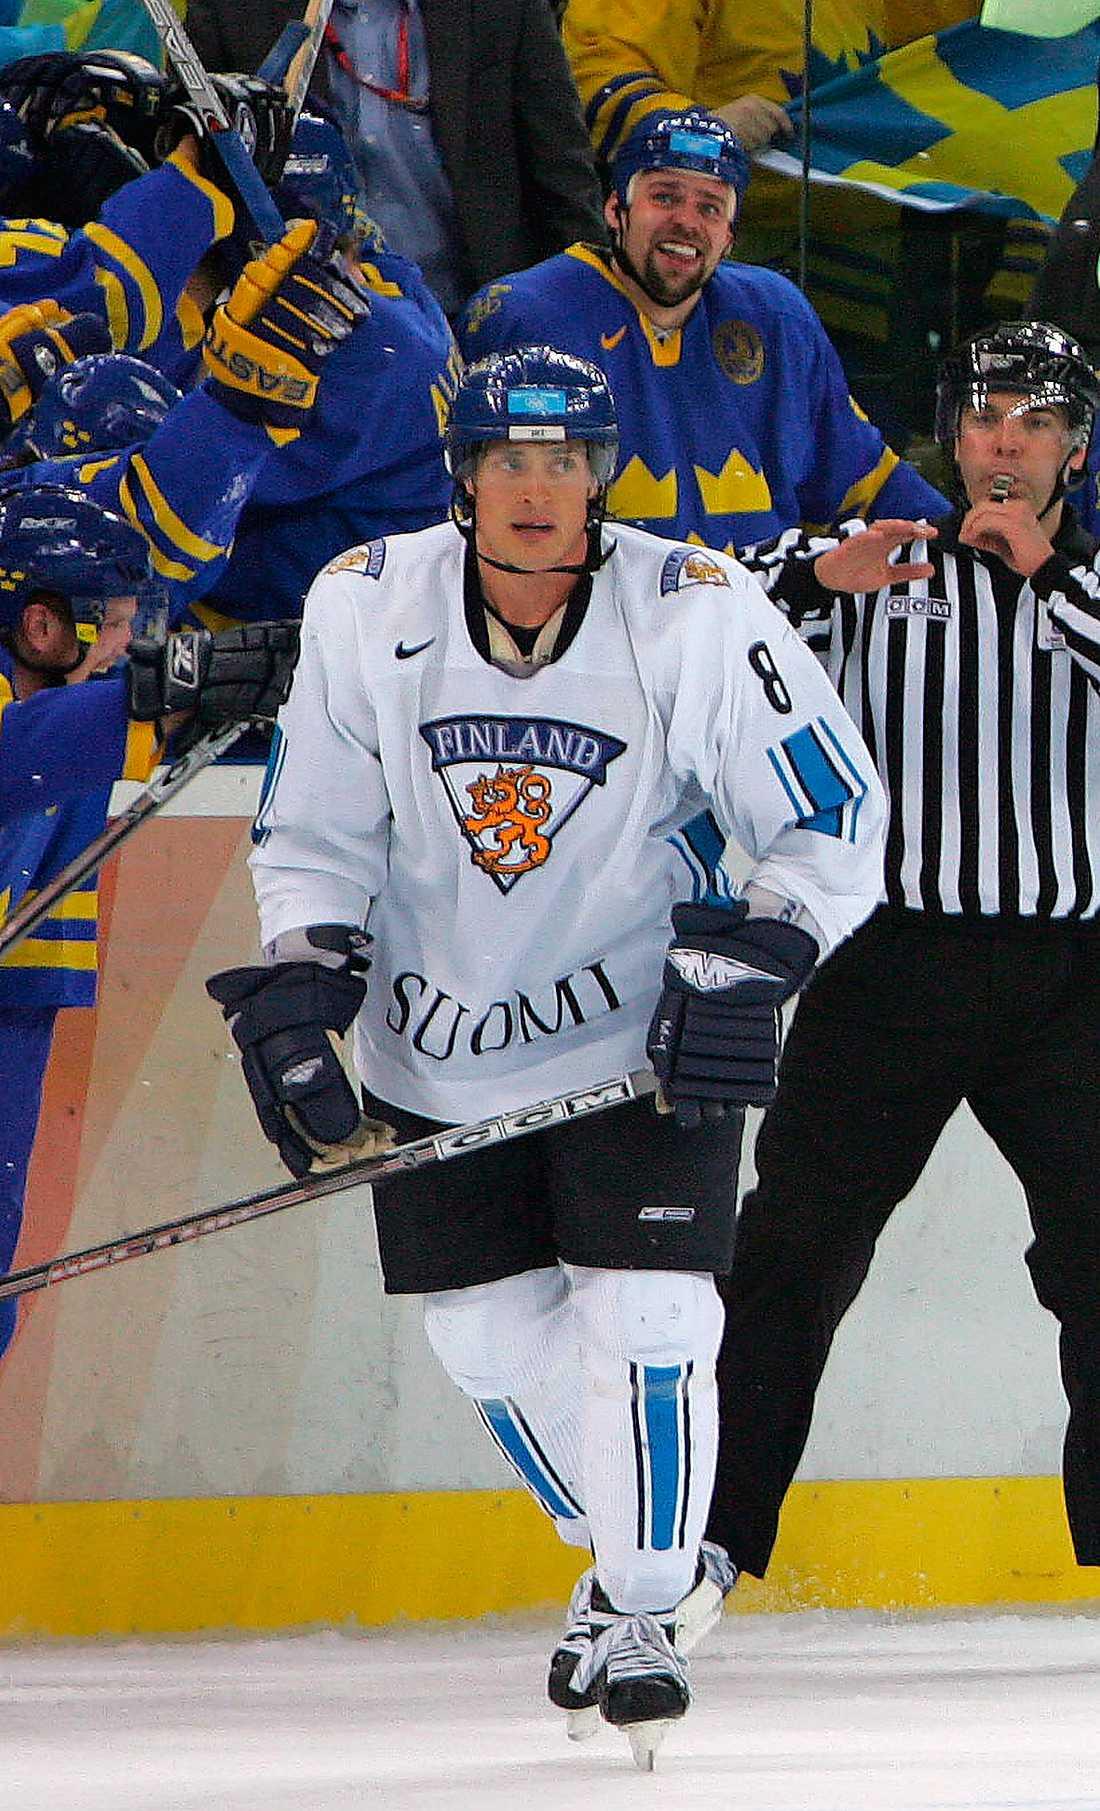 Selänne i OS 2006, TURIN 8 matcher, 6 mål + 5 assist = 11 poäng. Finlands placering: SILVER